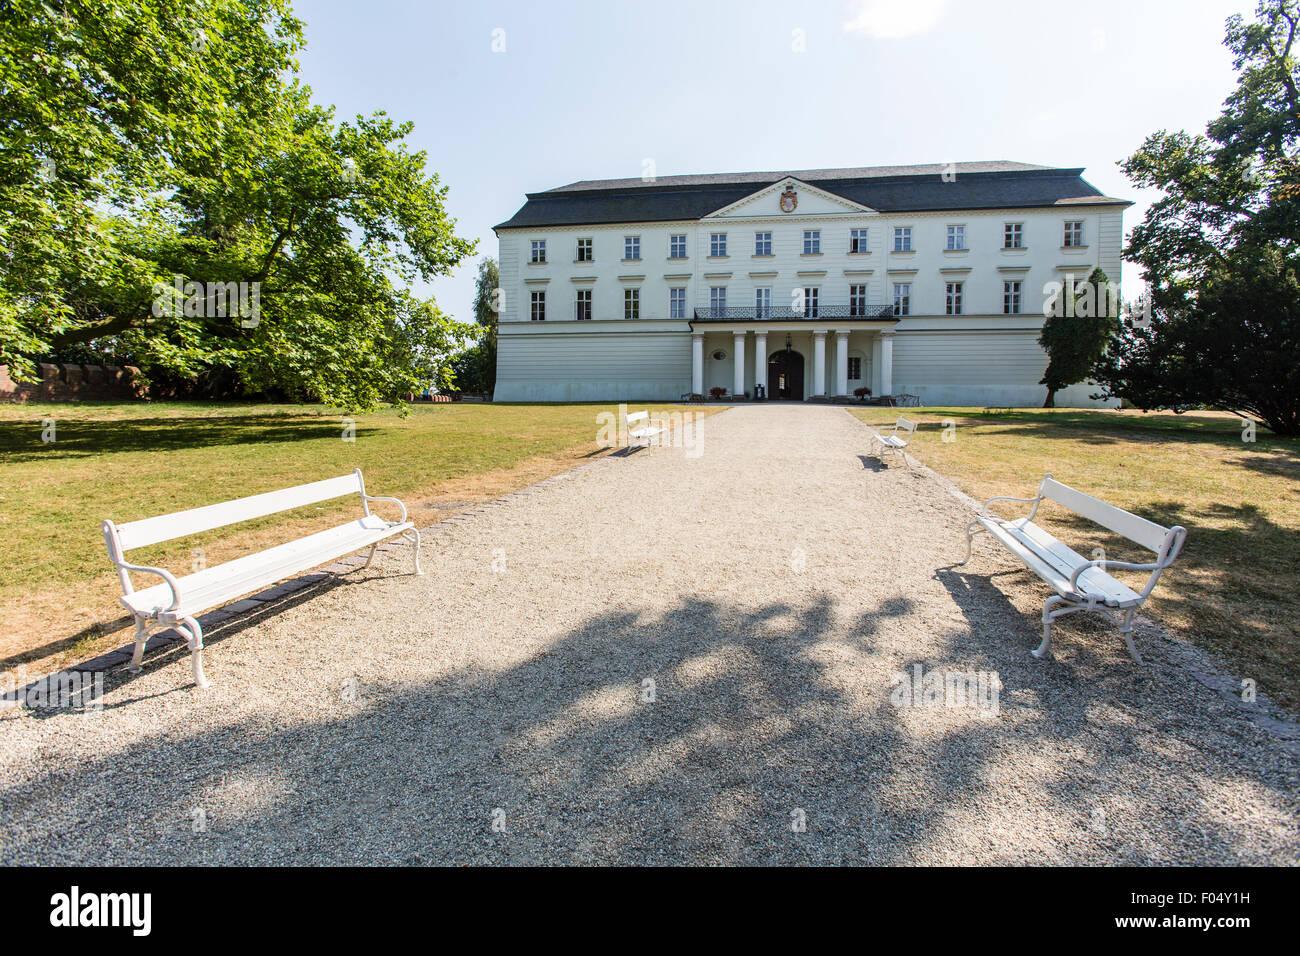 castle, chateau, classicism, sight, cultural heritage site, Hradec nad Moravici, Silesia - Stock Image